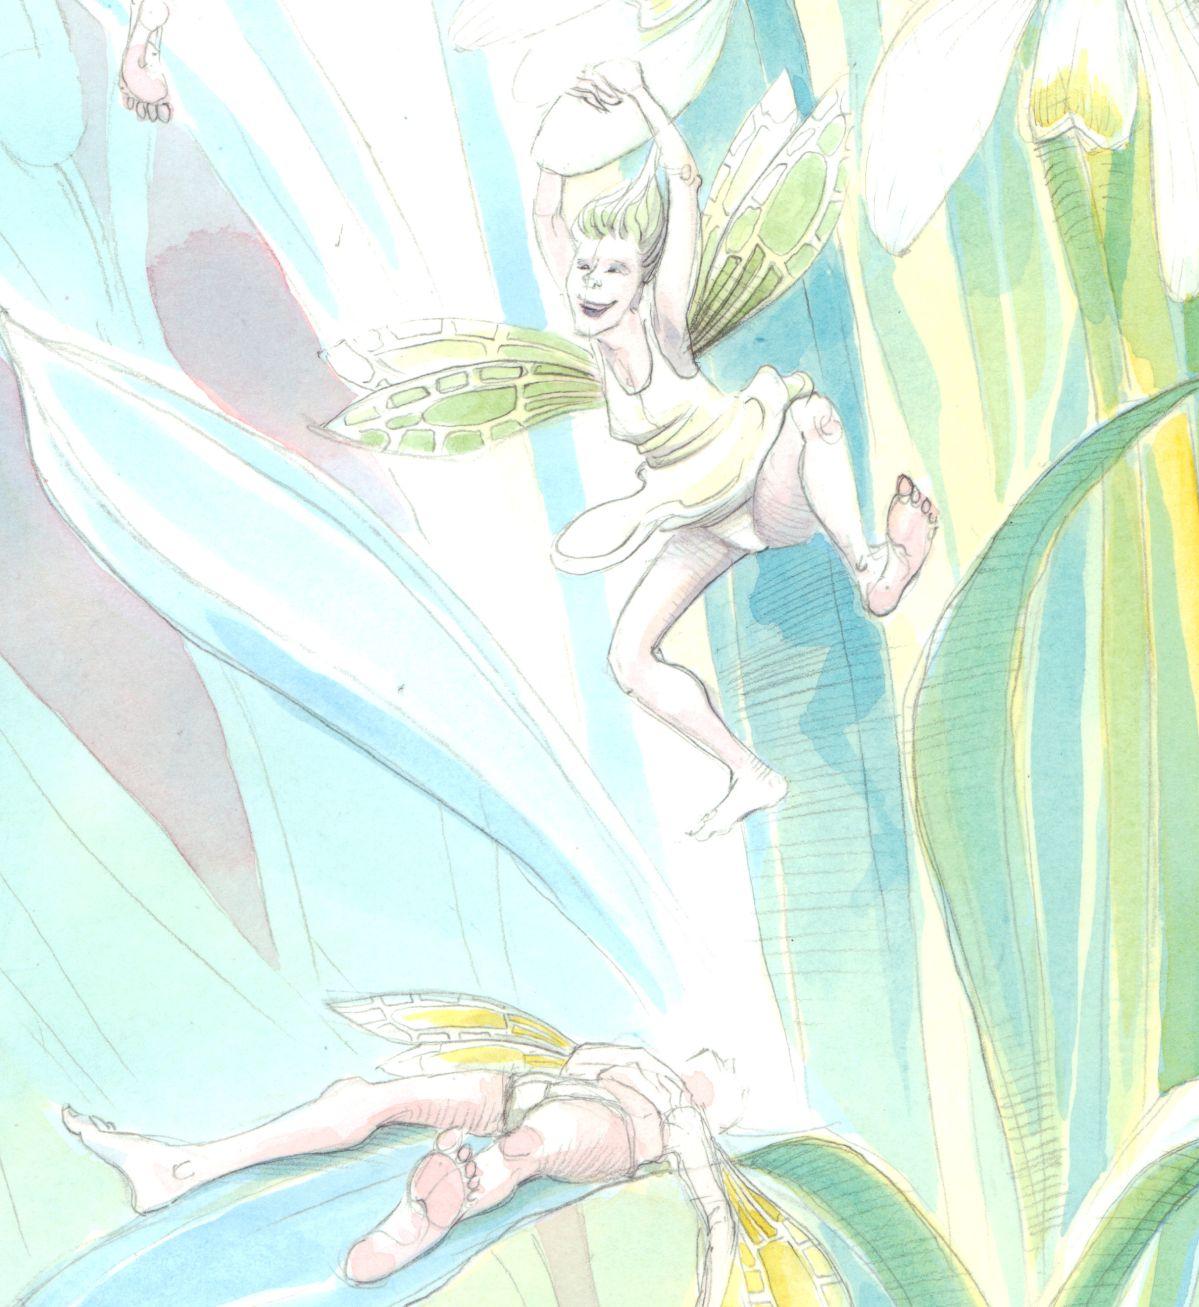 Snowdrop fairies... and their pants!